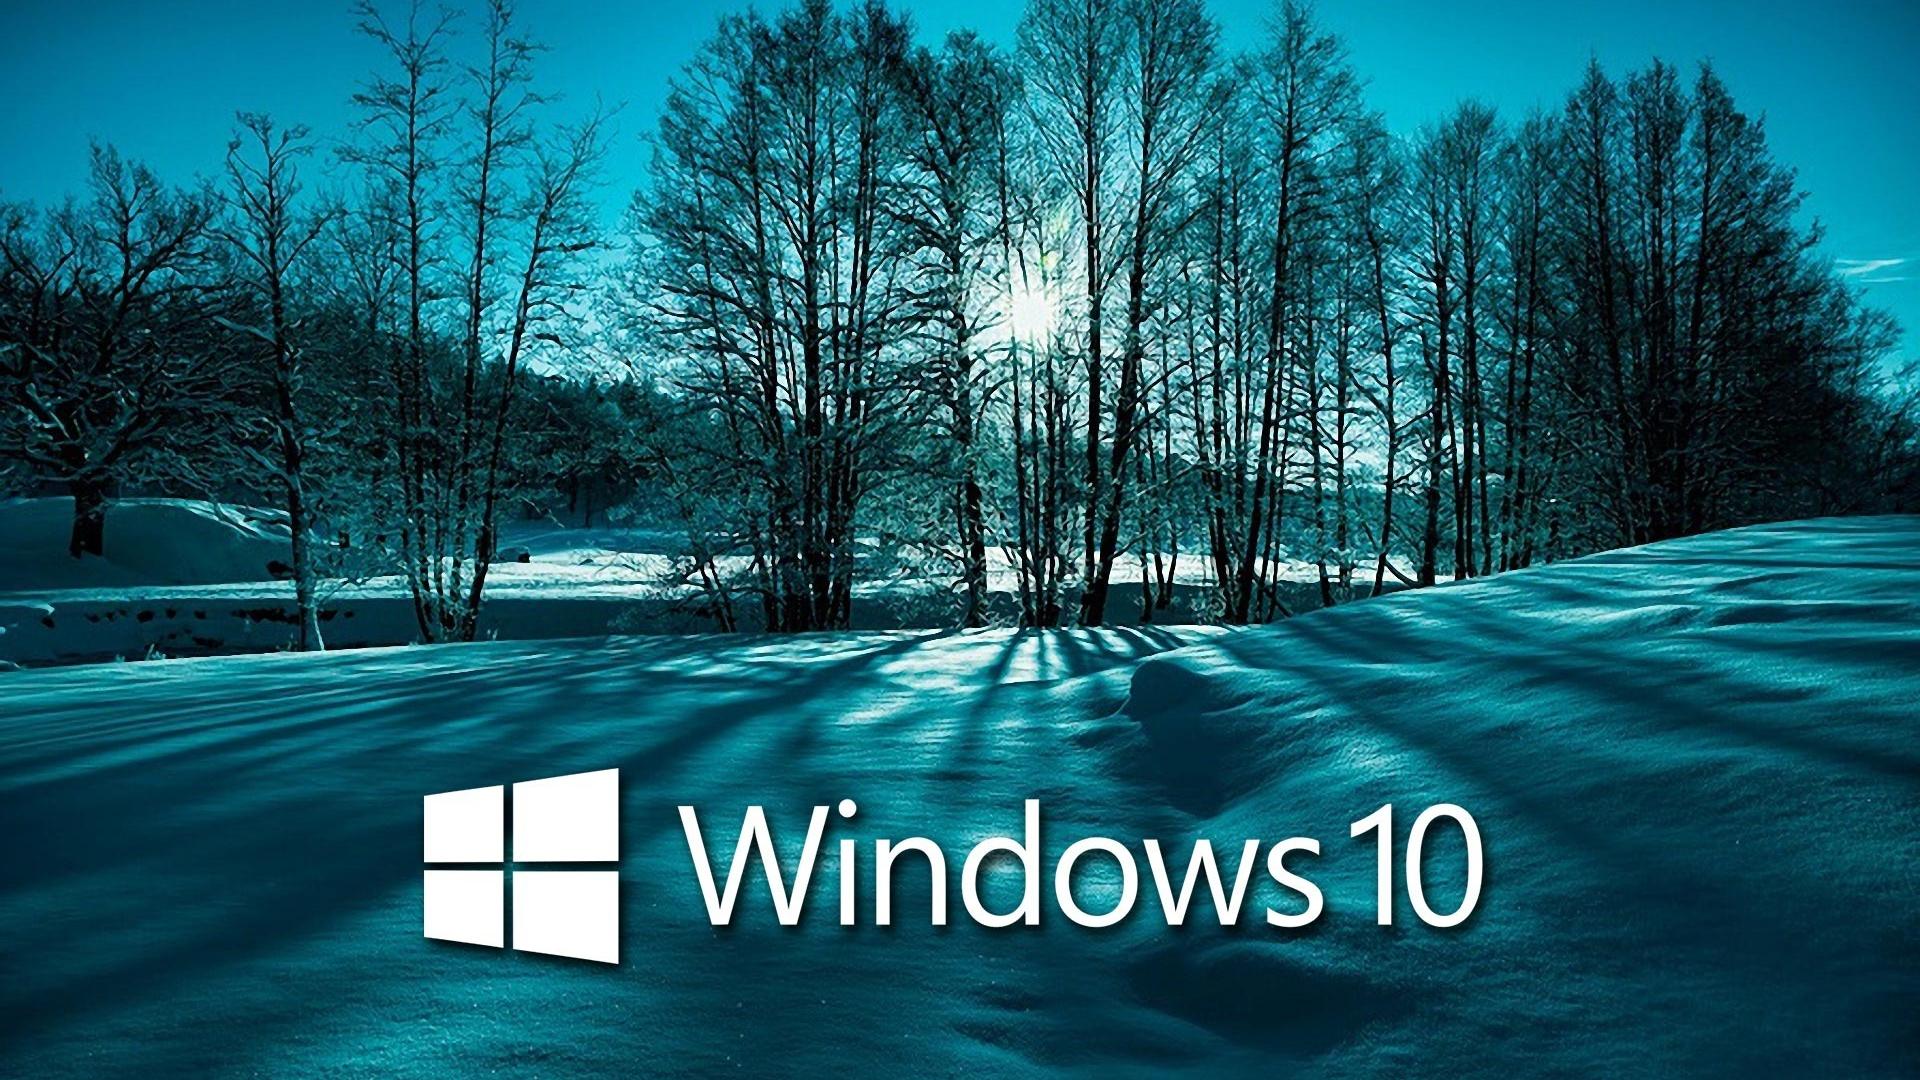 Free Download 10 Best Windows 10 Wallpapers Hd Wallpapers